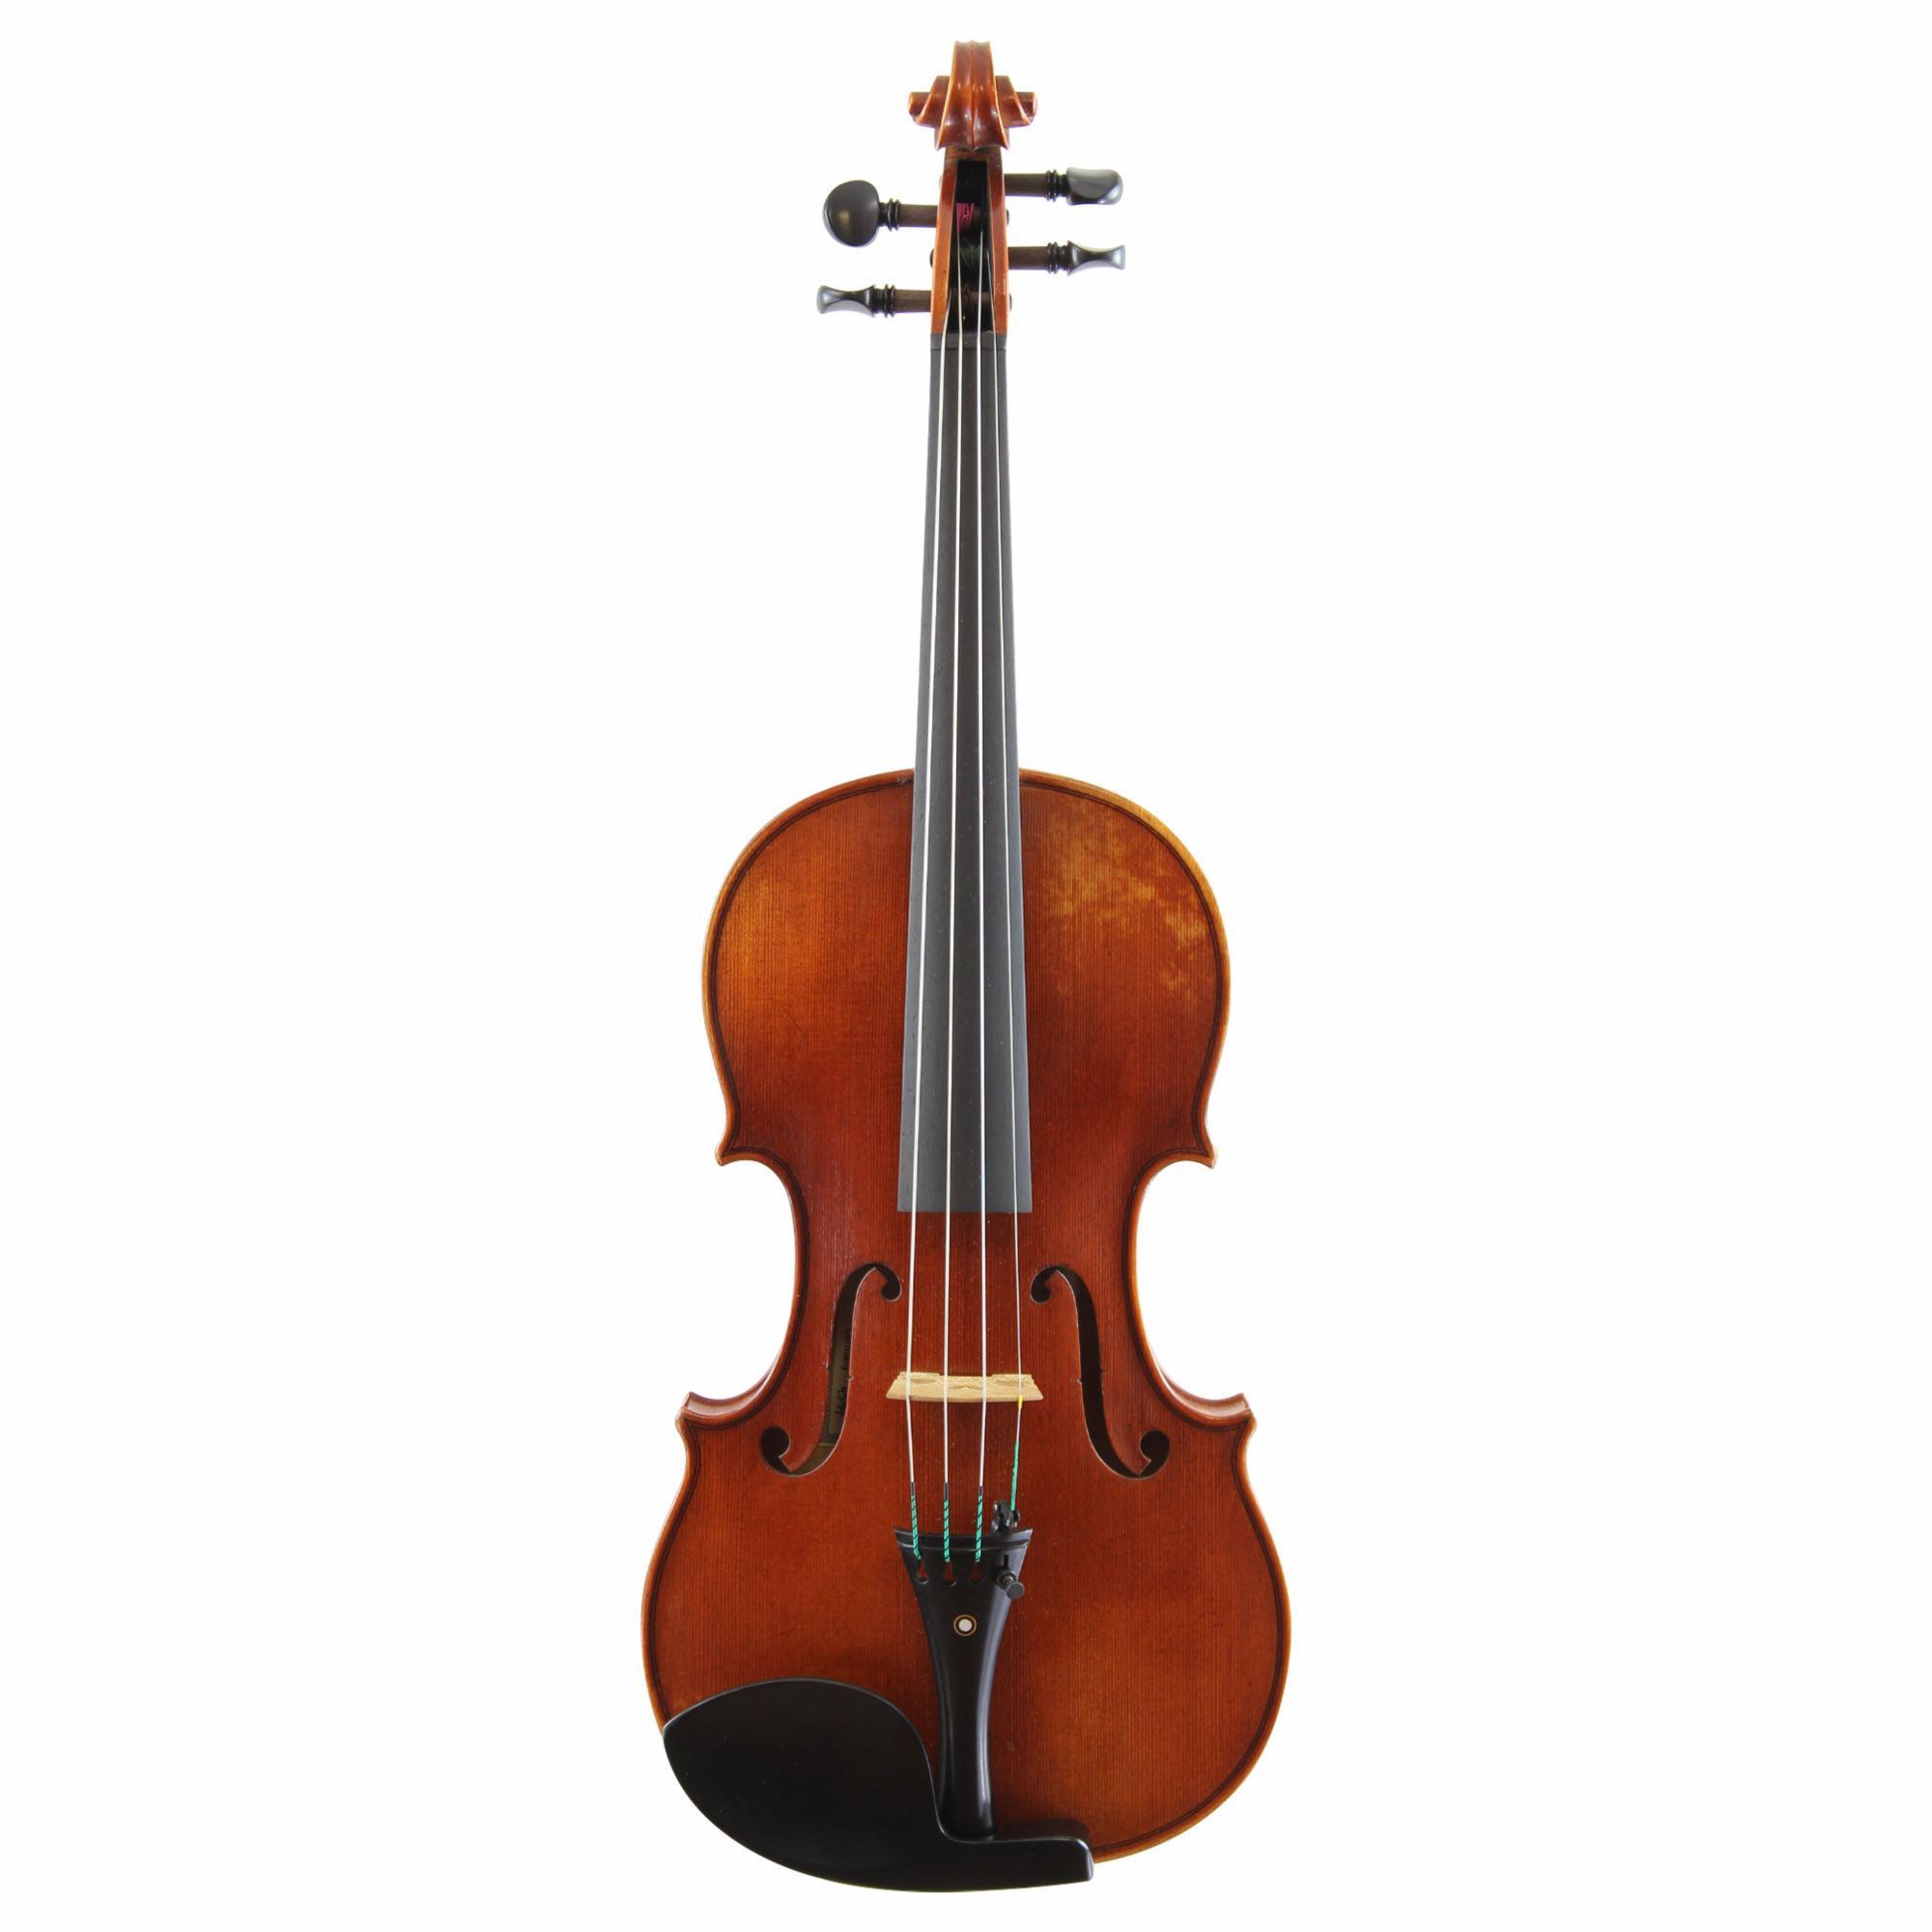 Franz Werner Virtuoso Violin